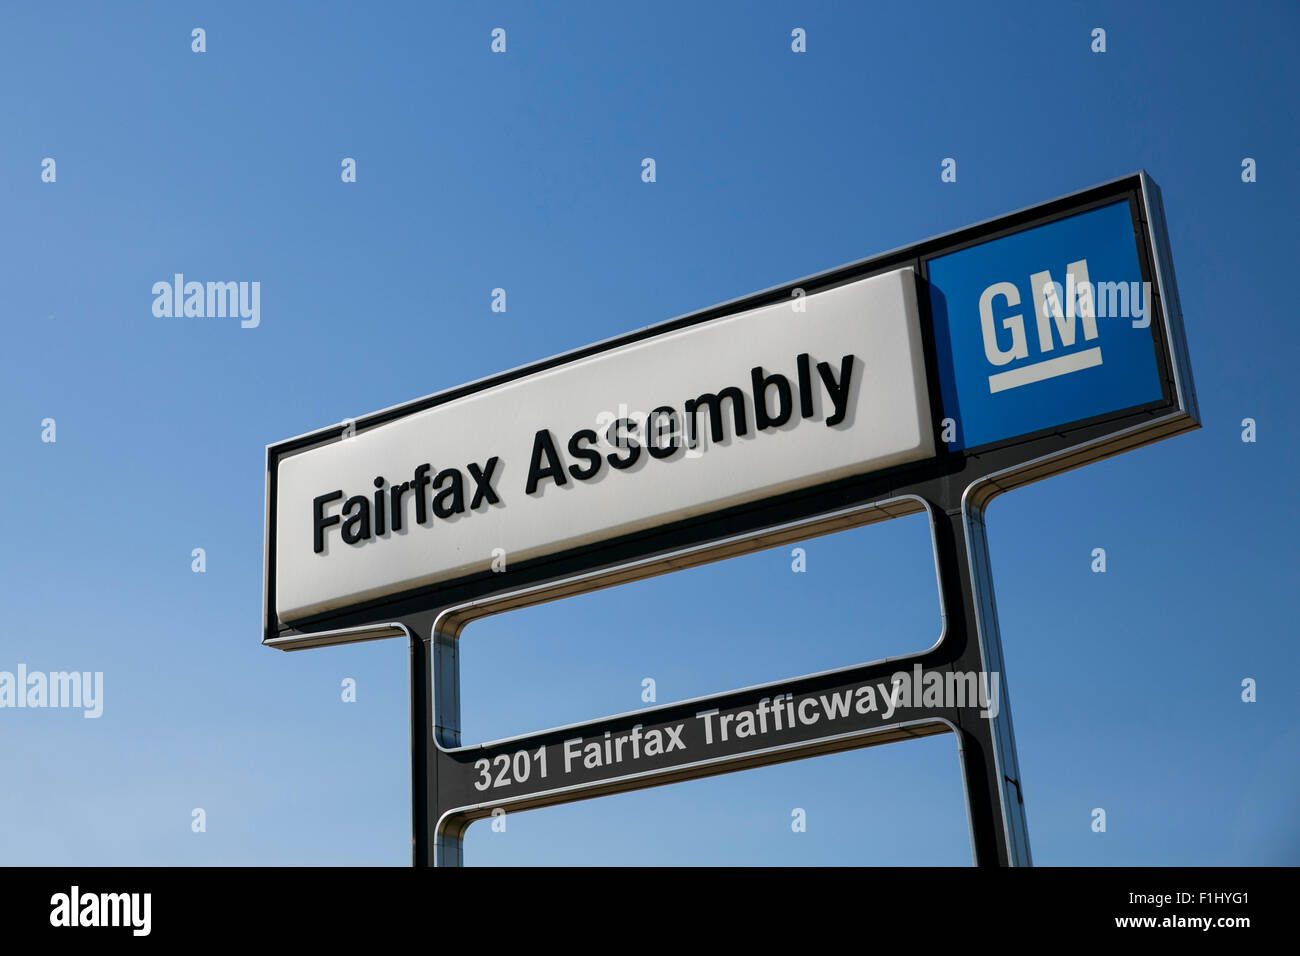 Fairfax city stock photos fairfax city stock images alamy for Fairfax motors fairfax va